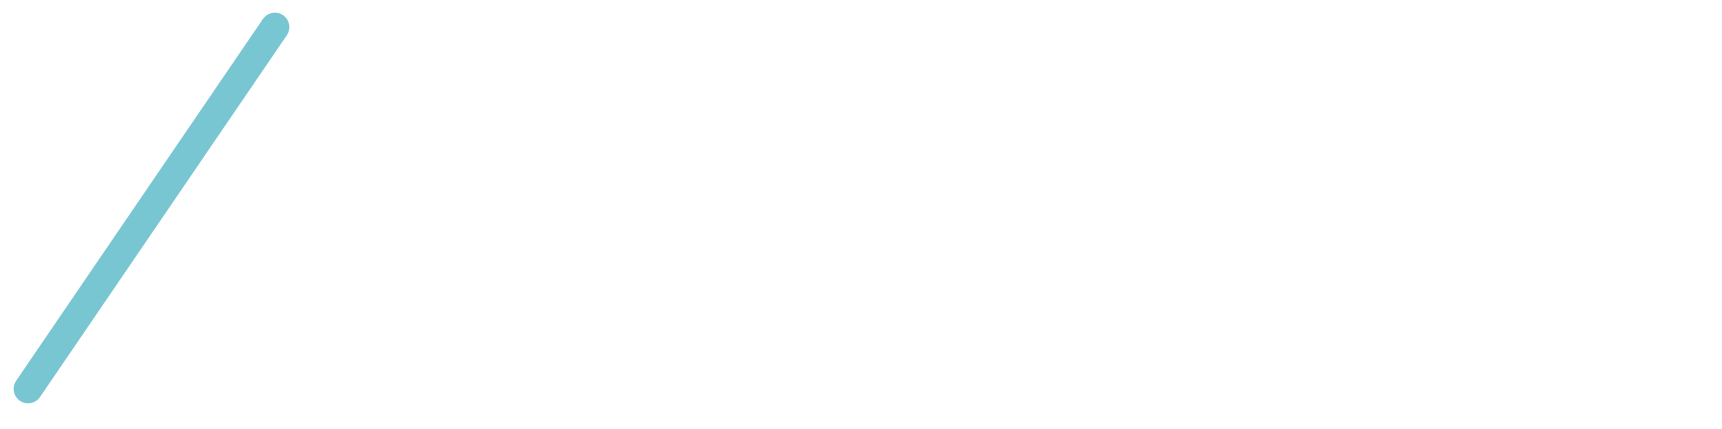 EducationCloset Arts Integration and STEAM Accelerator Program